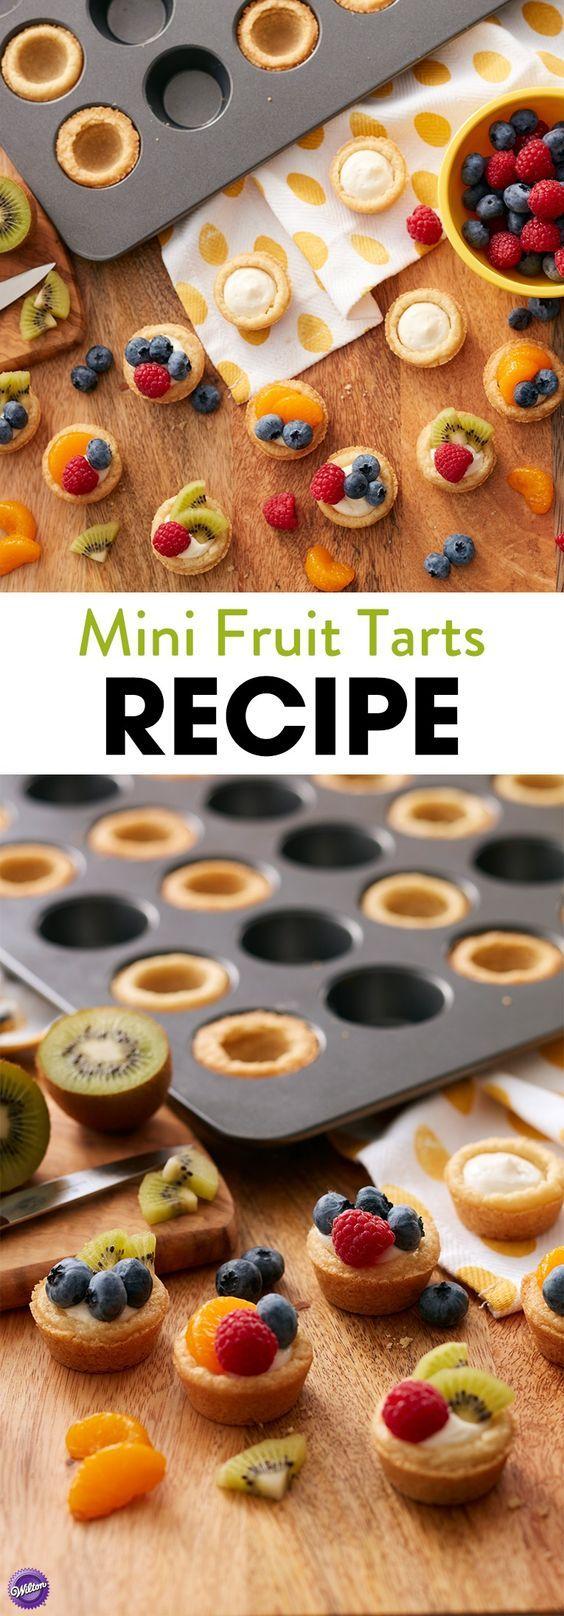 Delicious Mini Fruit Tarts Recipe Mini Fruit Tarts Tart